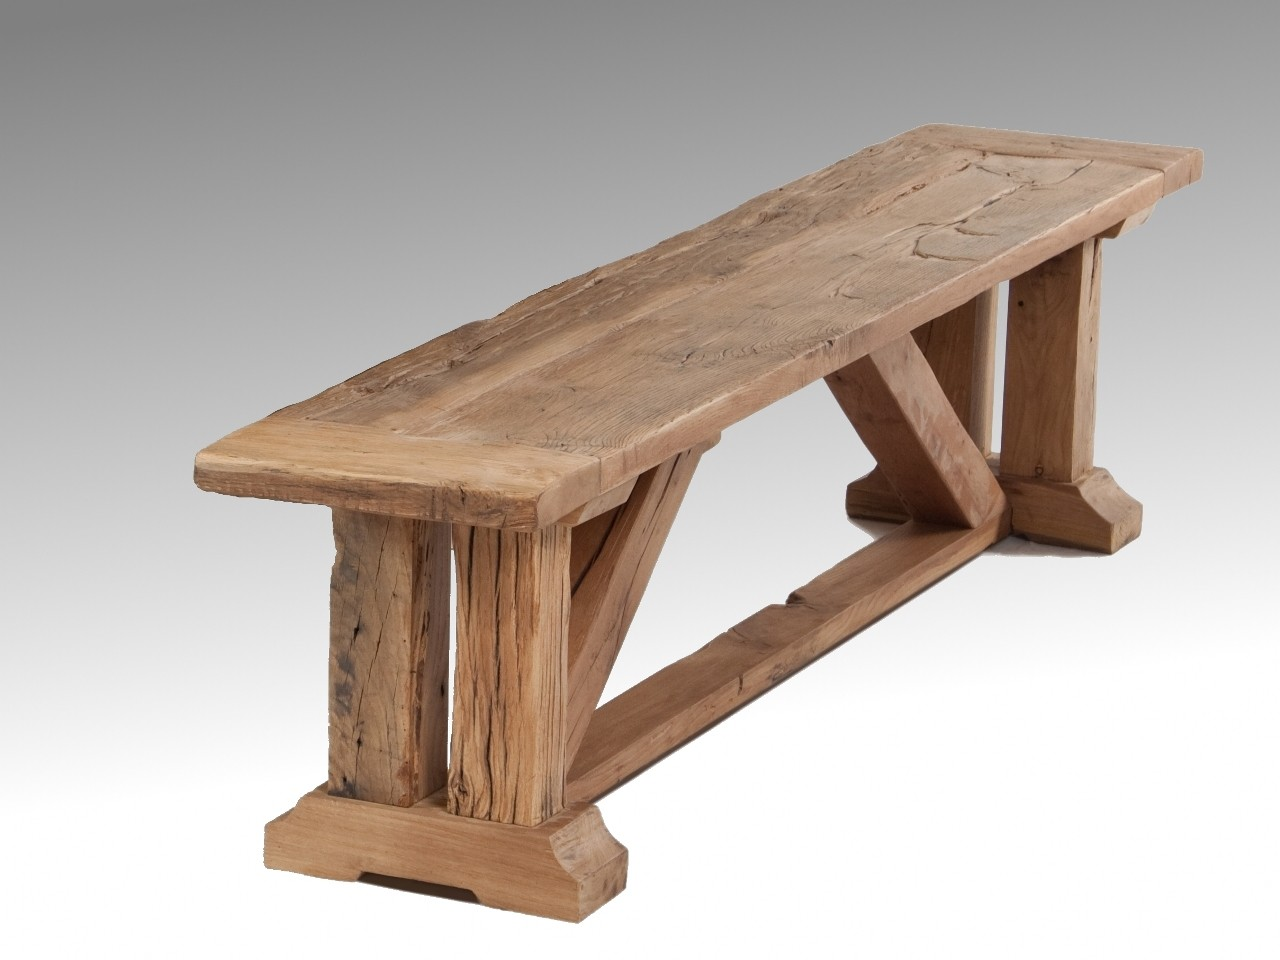 massivholz sitzb nke aus eiche altholzdesign. Black Bedroom Furniture Sets. Home Design Ideas